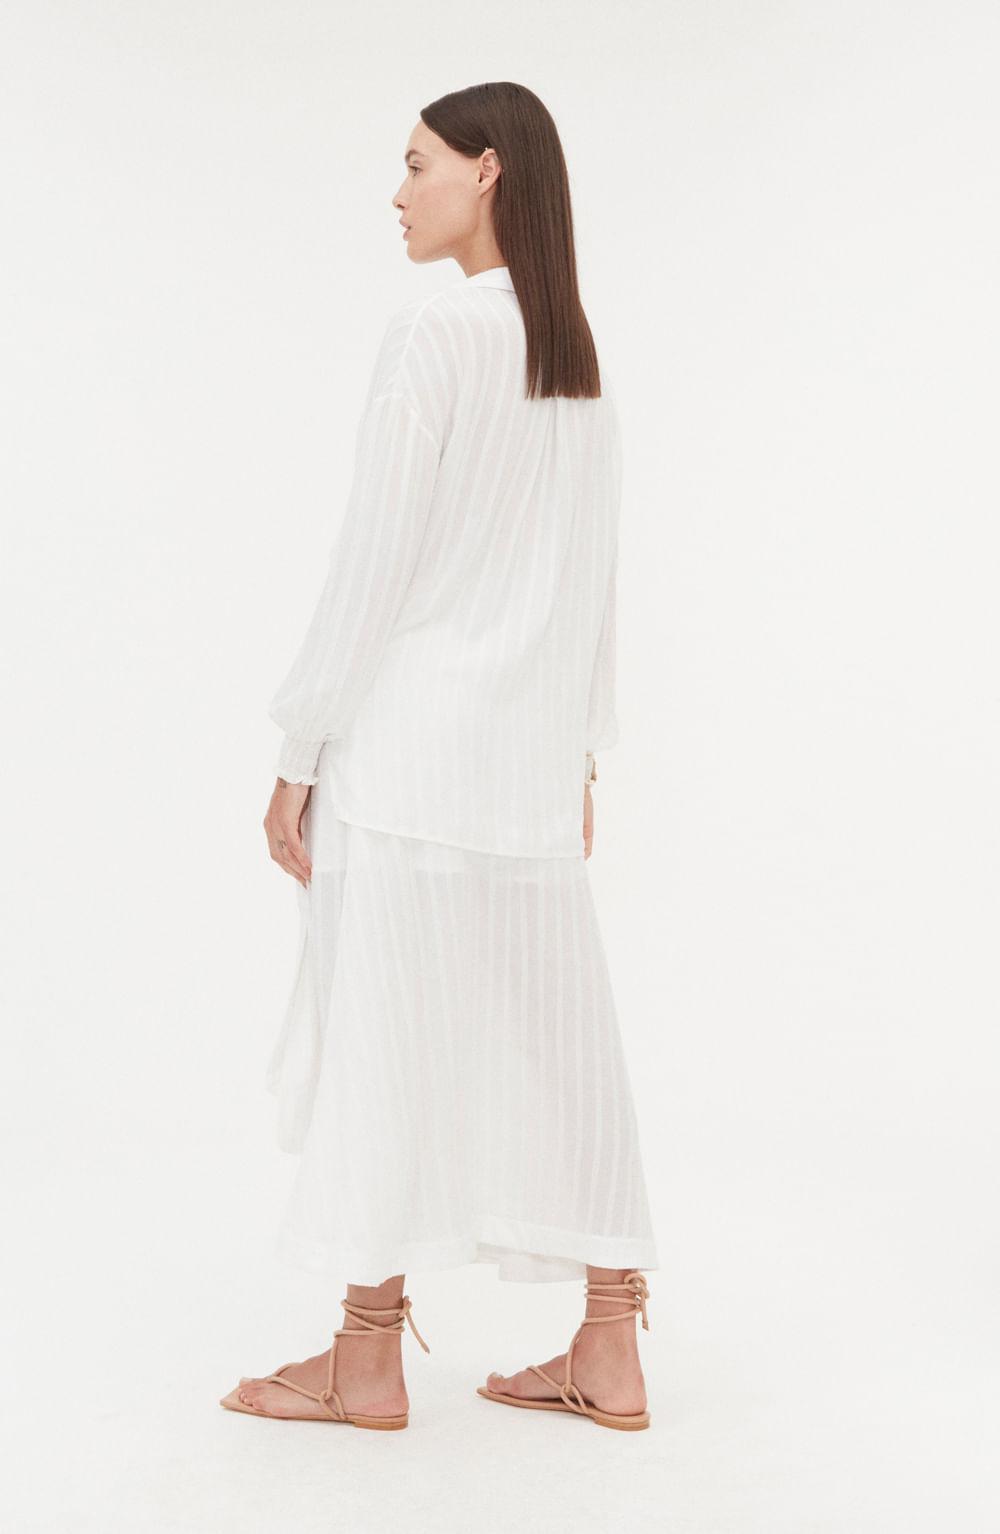 camisa branca manga longa